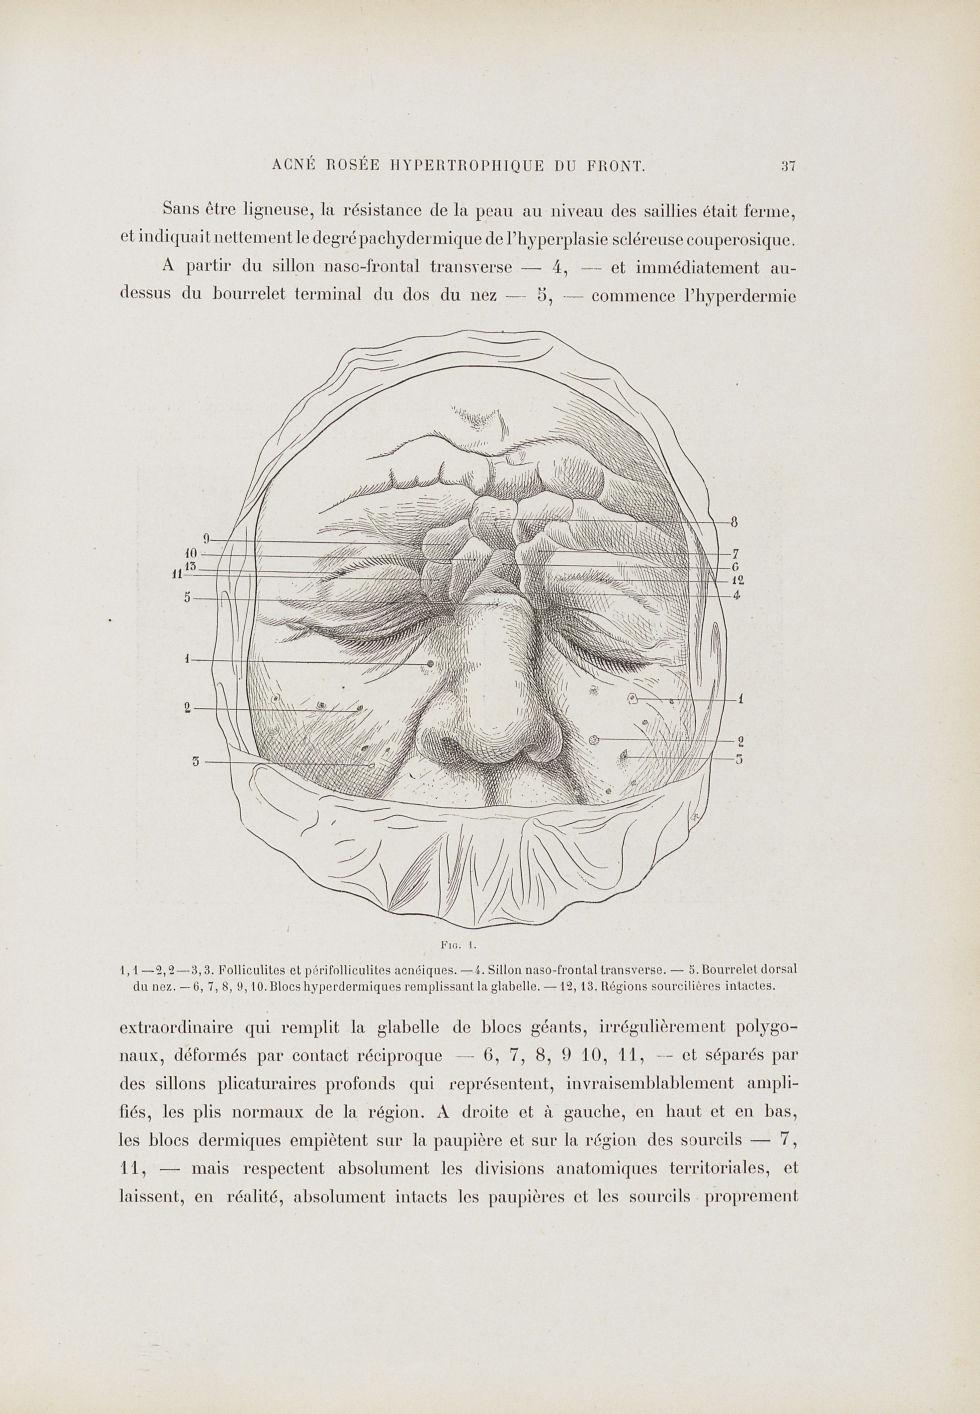 Fig. 1. Couperose hypertrophique - Dermatologie (peau). Visages (têtes). 19e siècle (France) - med01740x0051